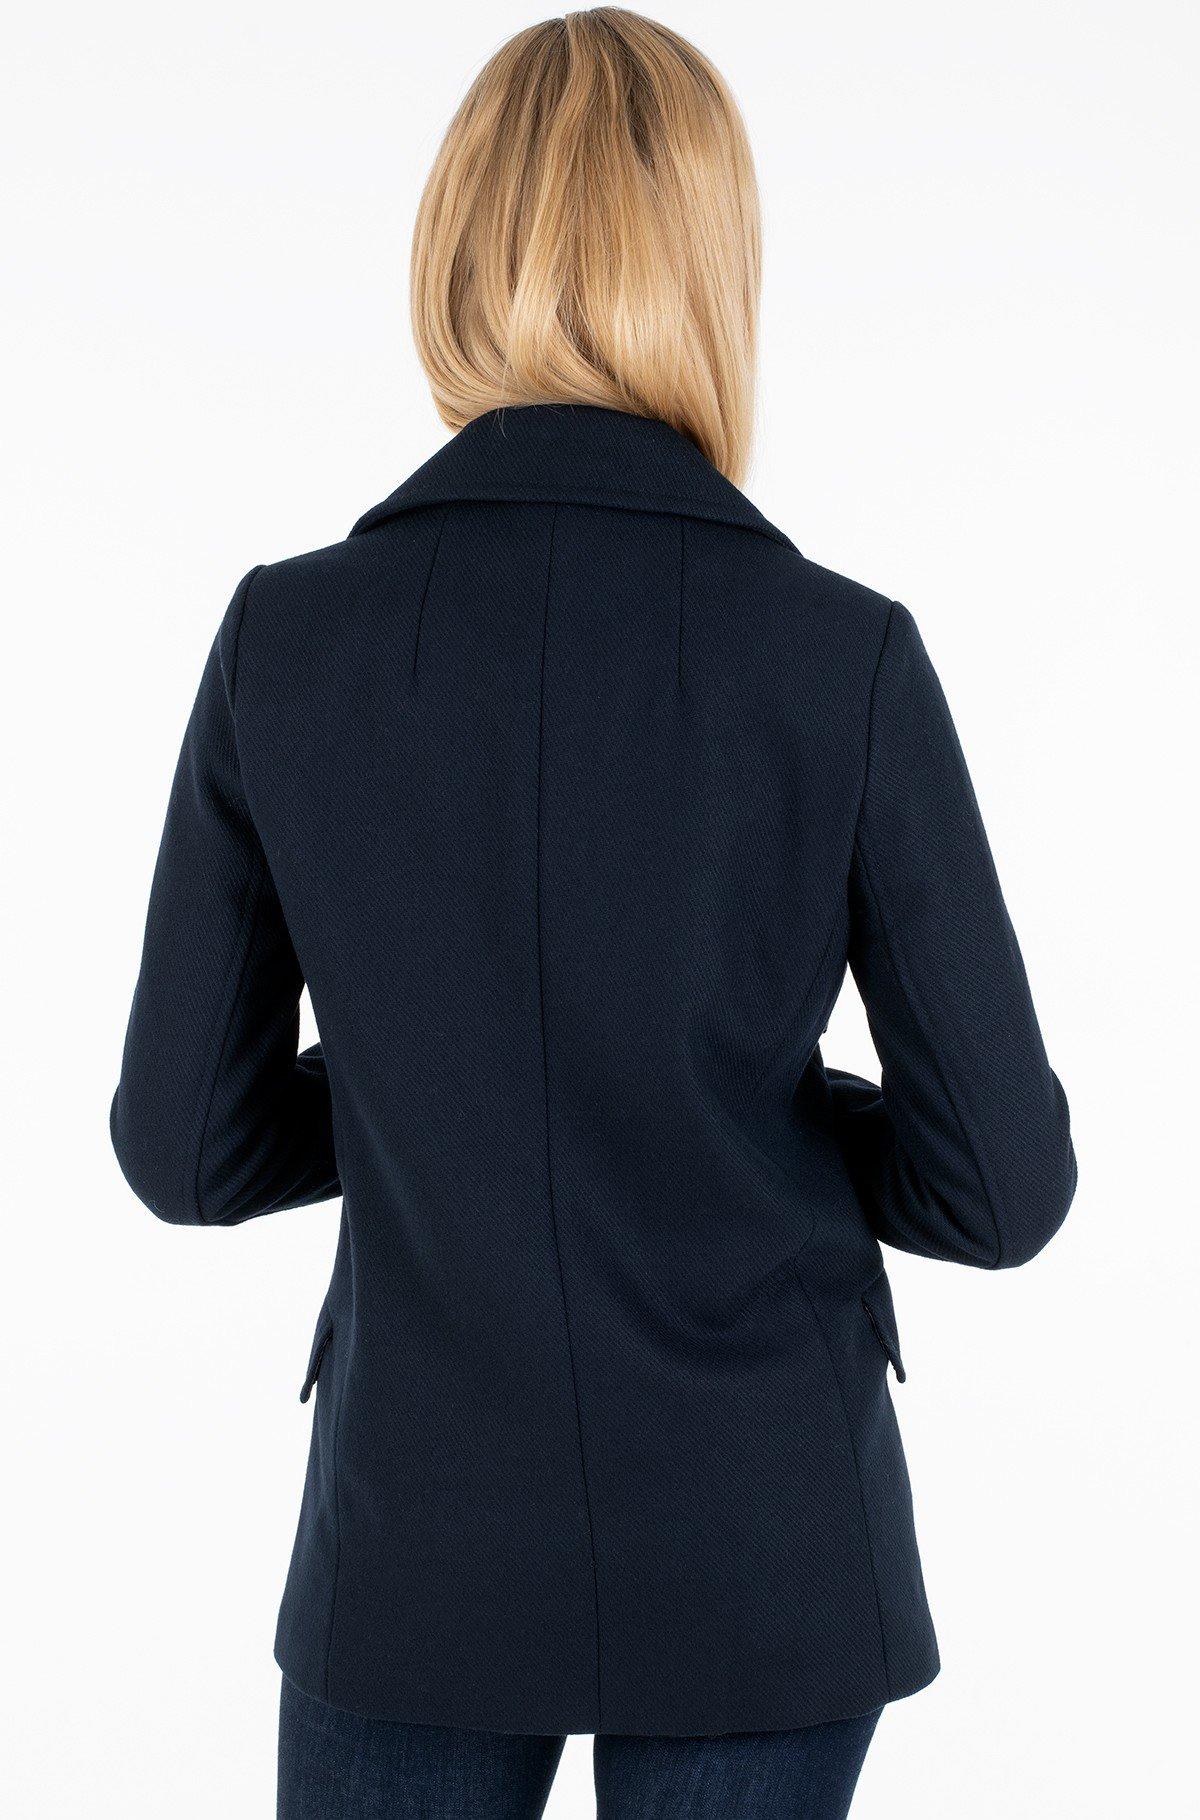 Jacket LEYRE/PL401864-full-3